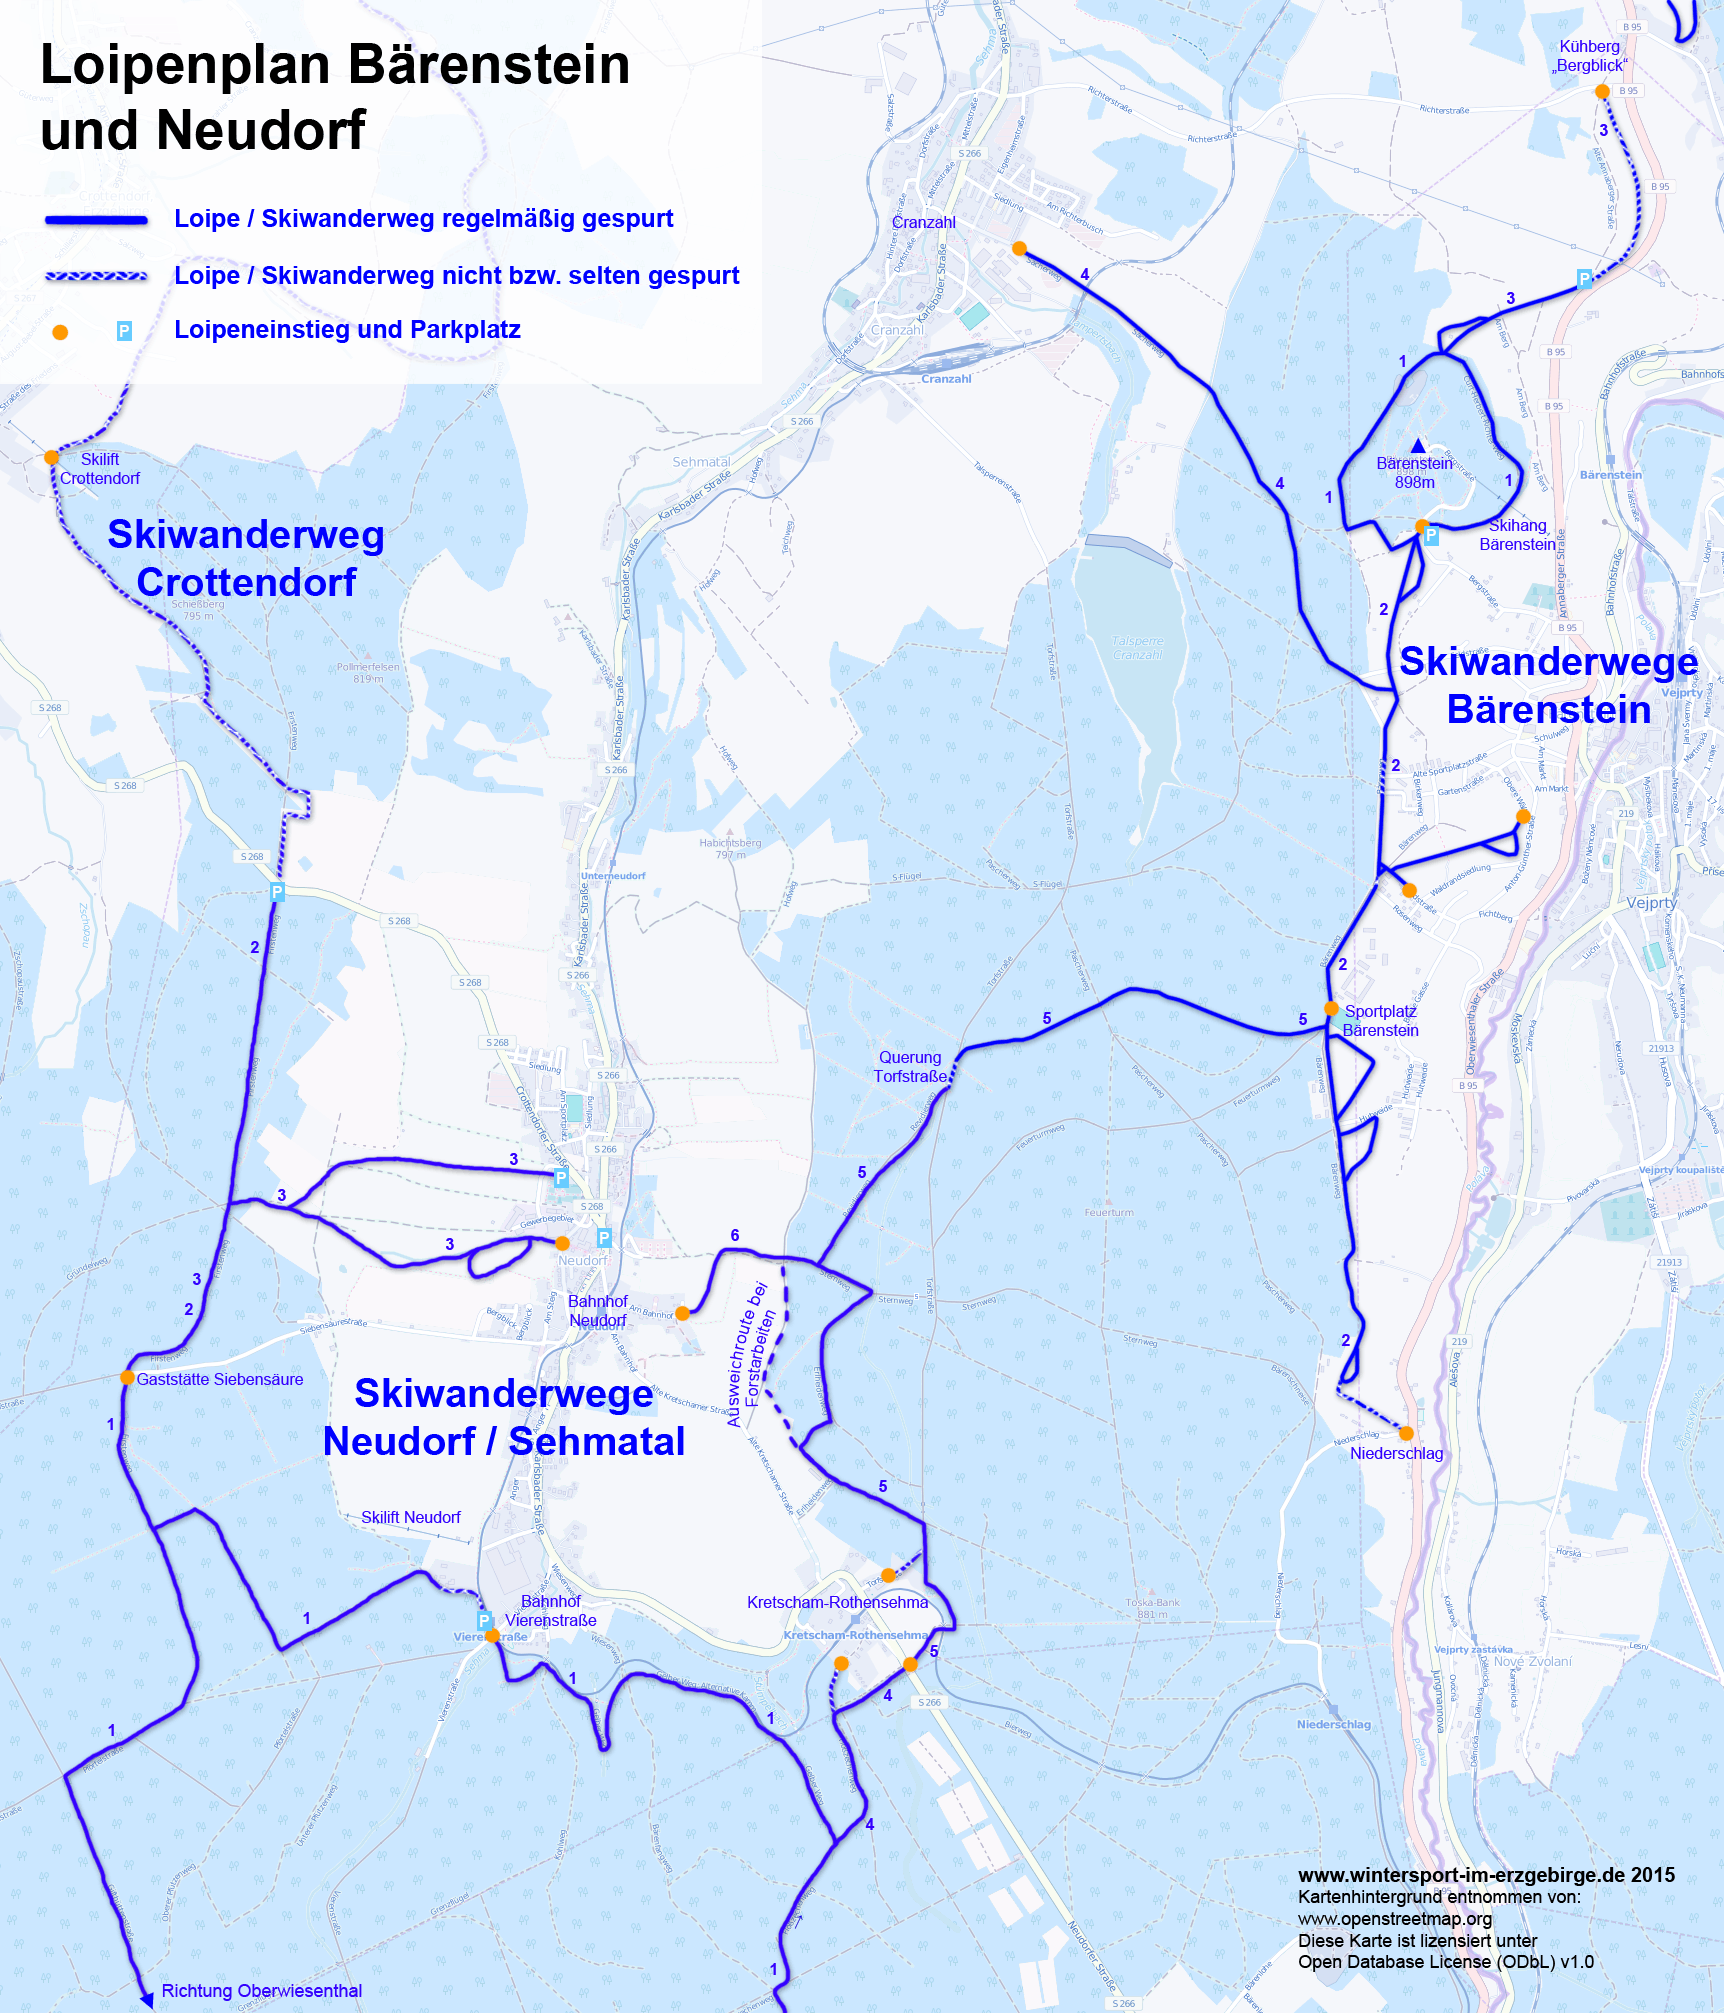 Loipenplan_Baerenstein